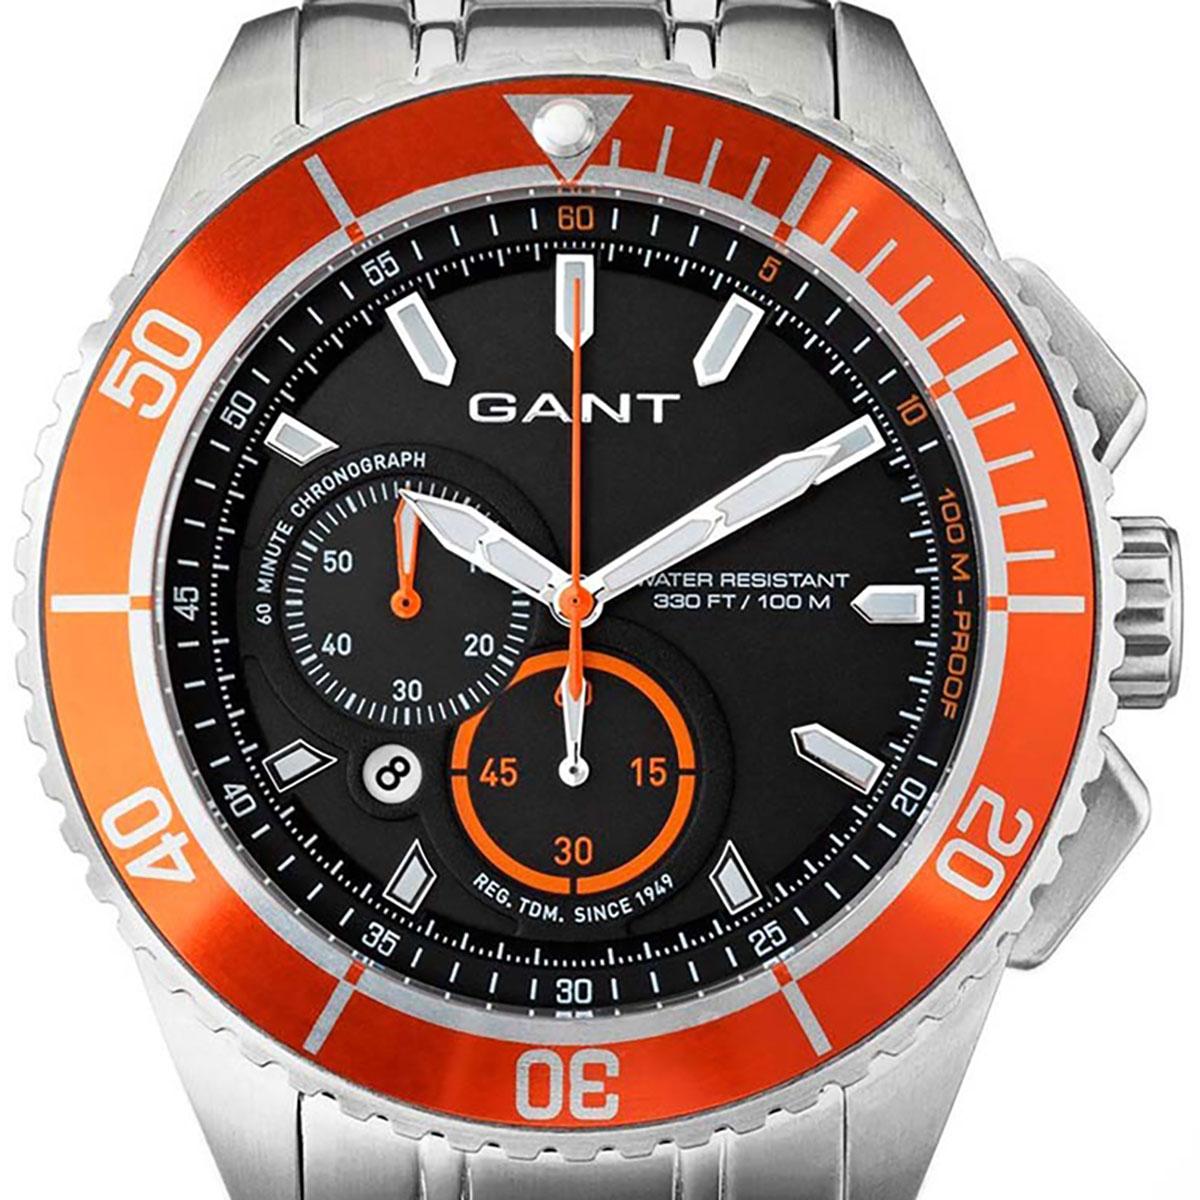 GANT ガント 電池式クォーツ 腕時計 [W70542] 並行輸入品 ブラック(黒)